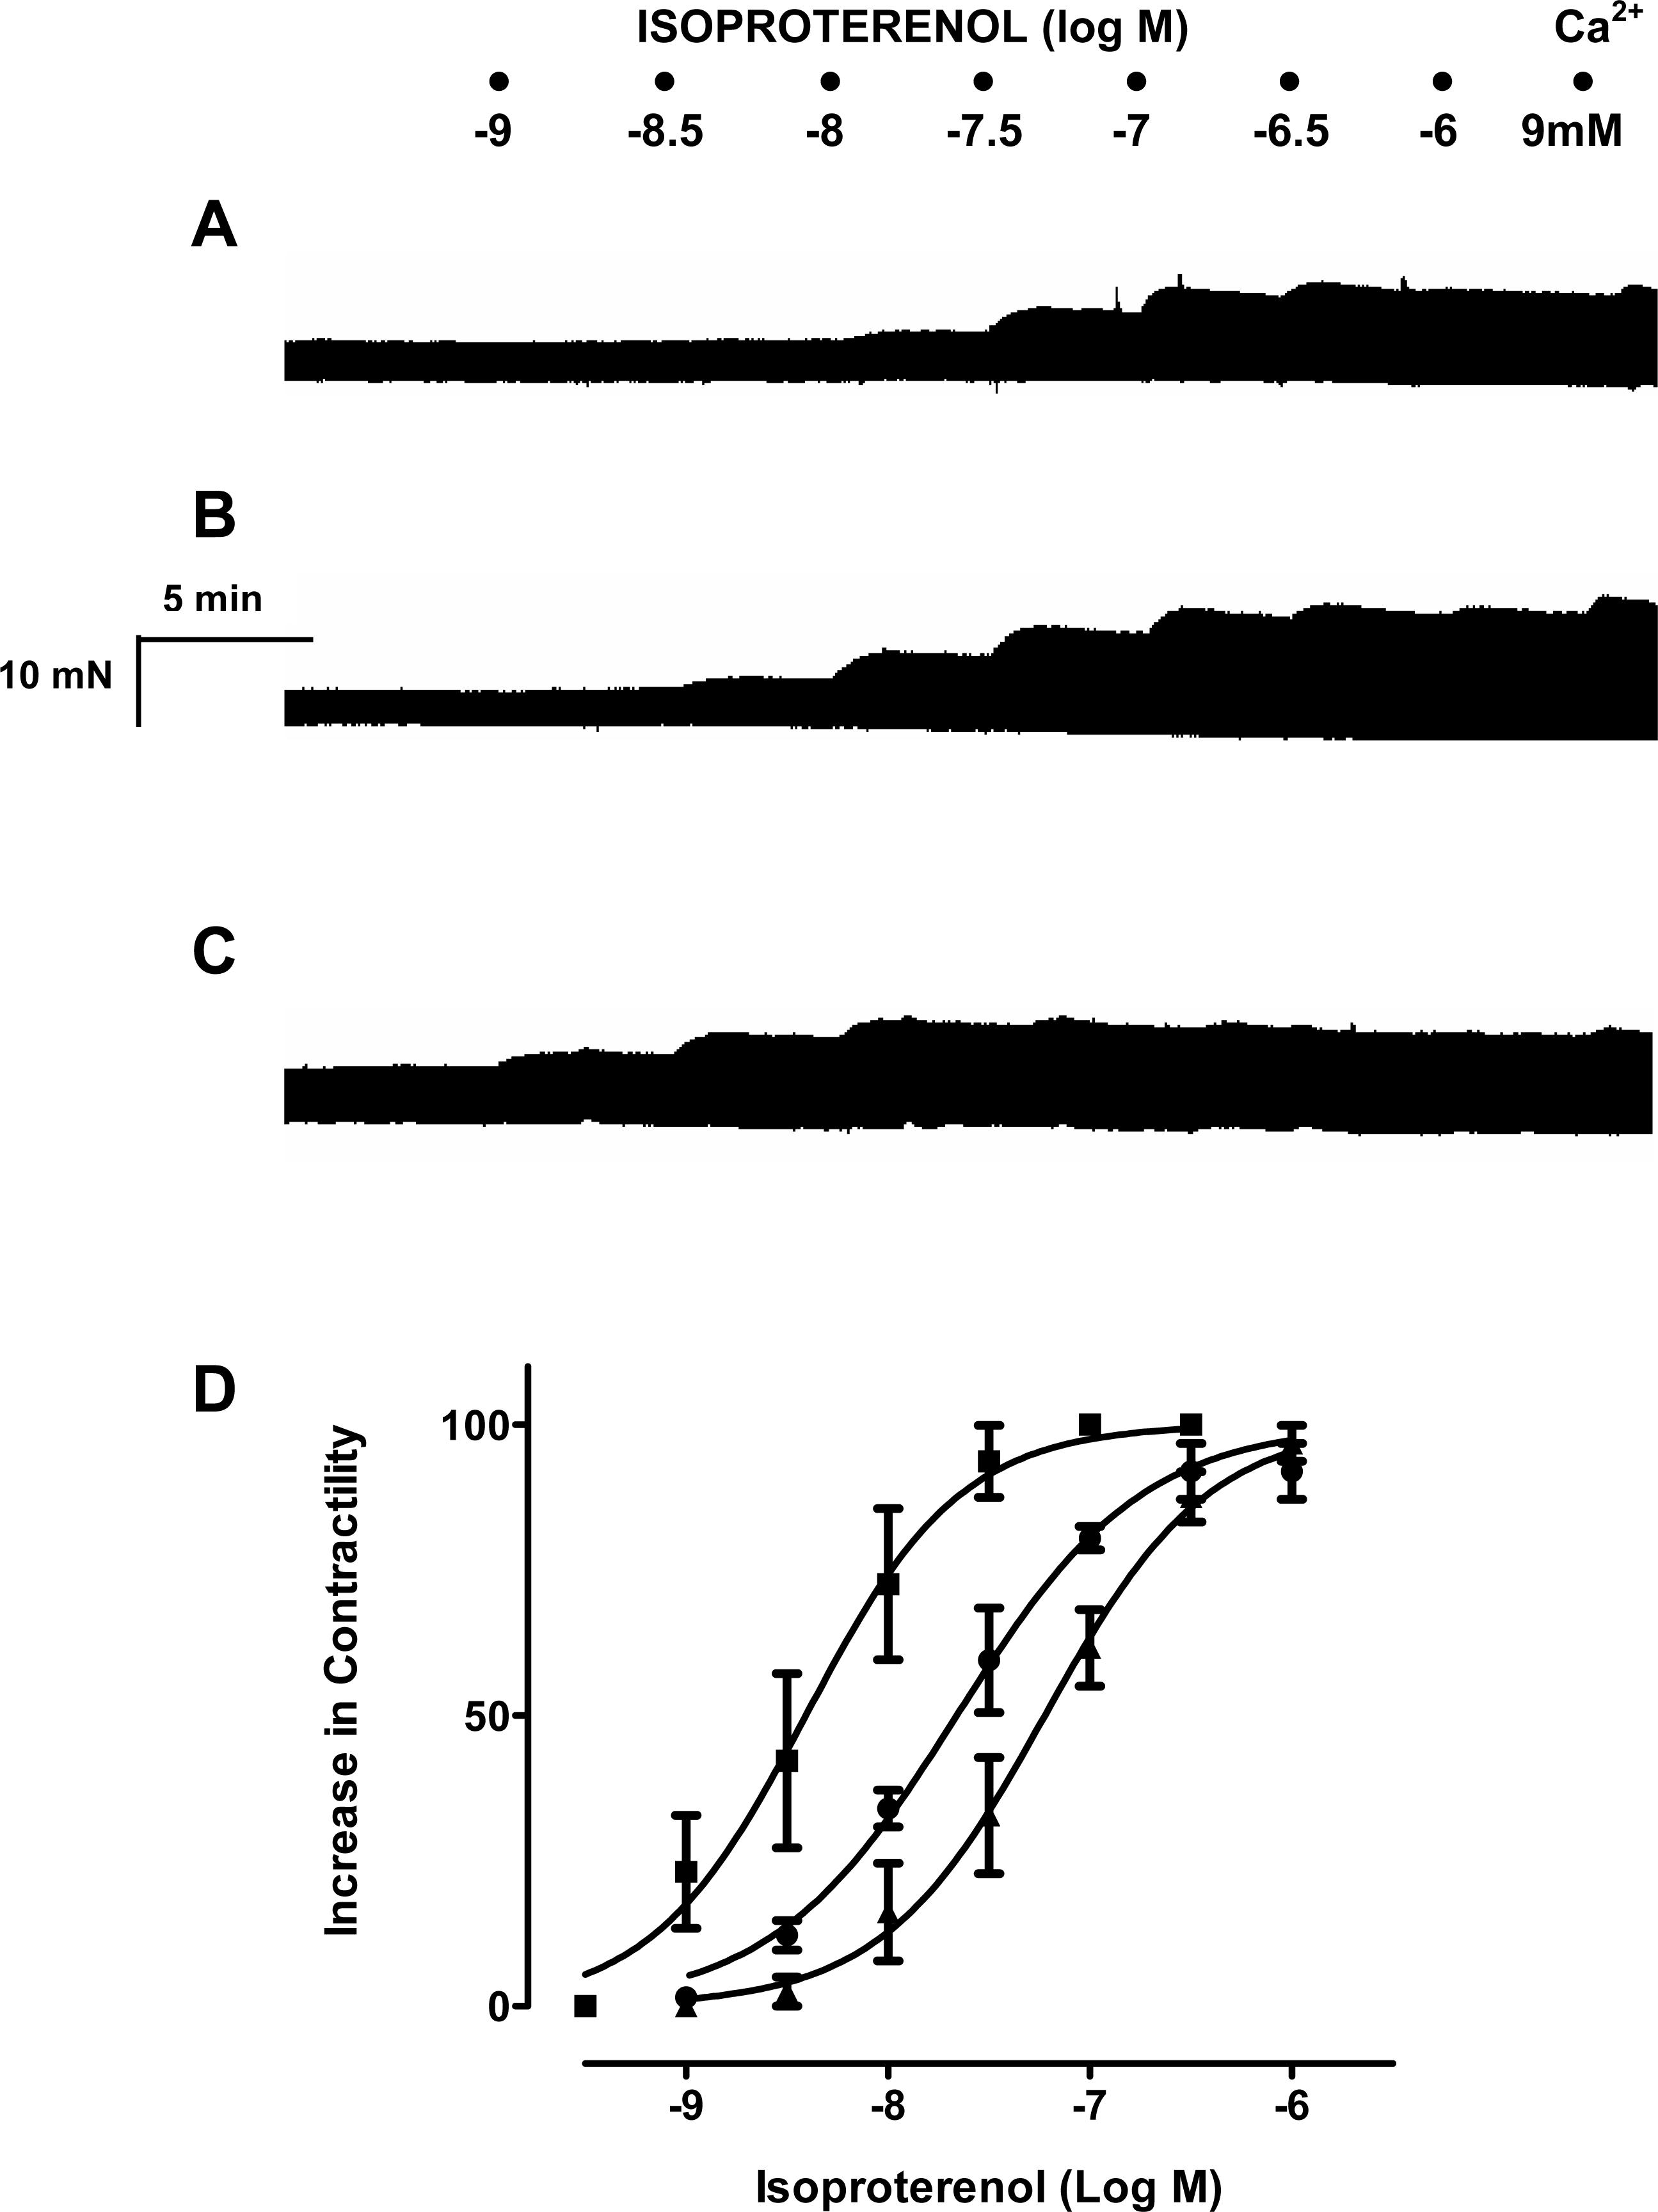 Resveratrol enhances the inotropic effect but inhibits the